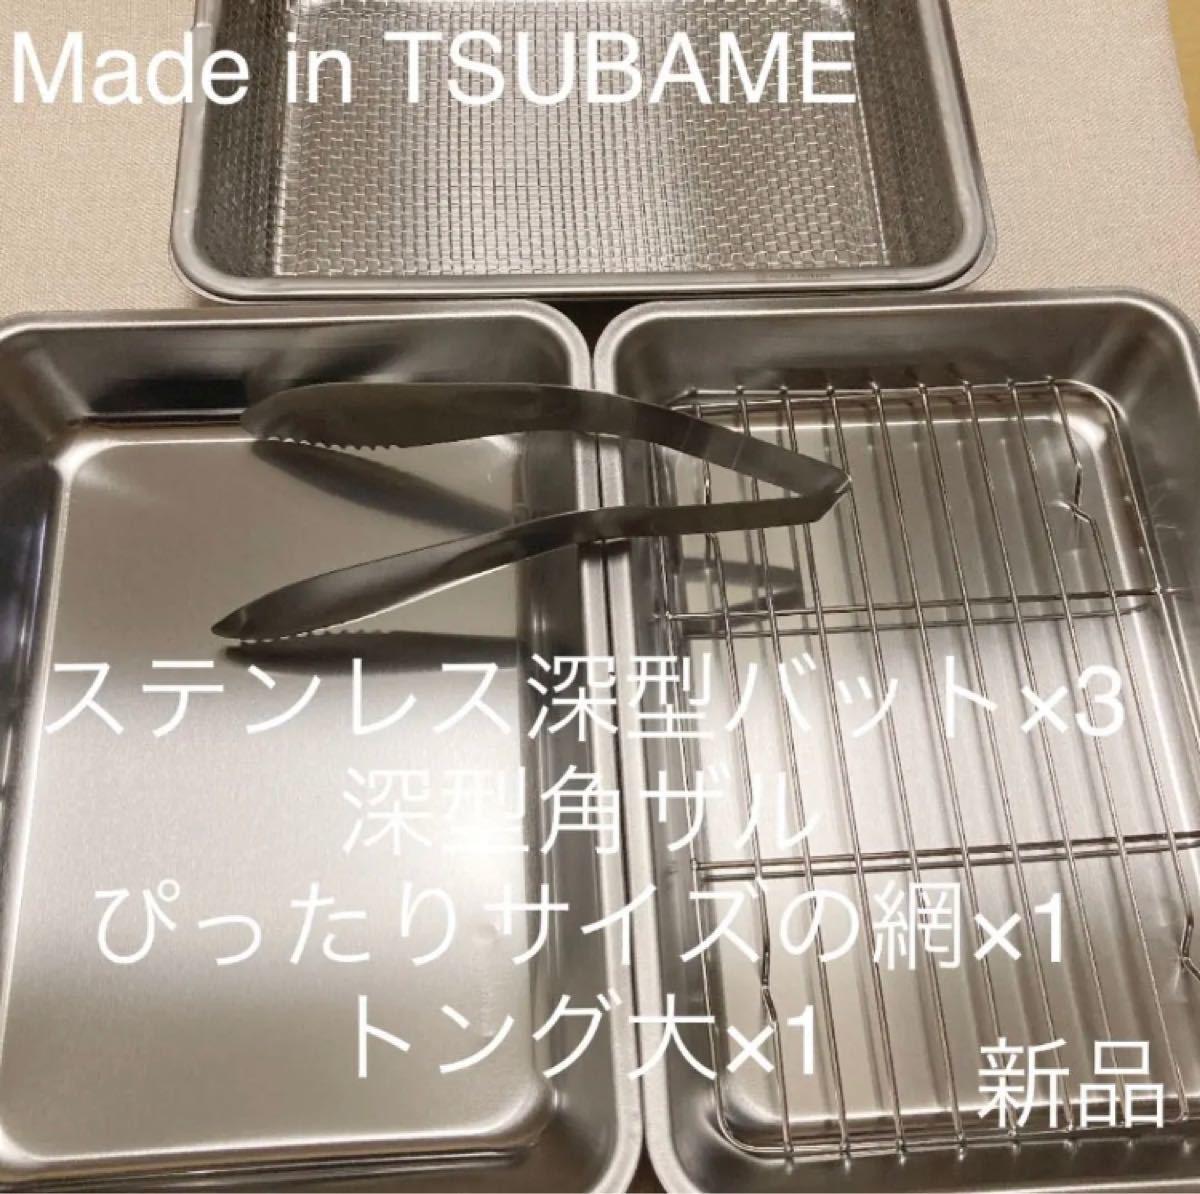 MADE in TSUBAMEステンレス深型バット×3、深型角ザル、ぴったりサイズの網、トングセット 新品 日本製 燕三条